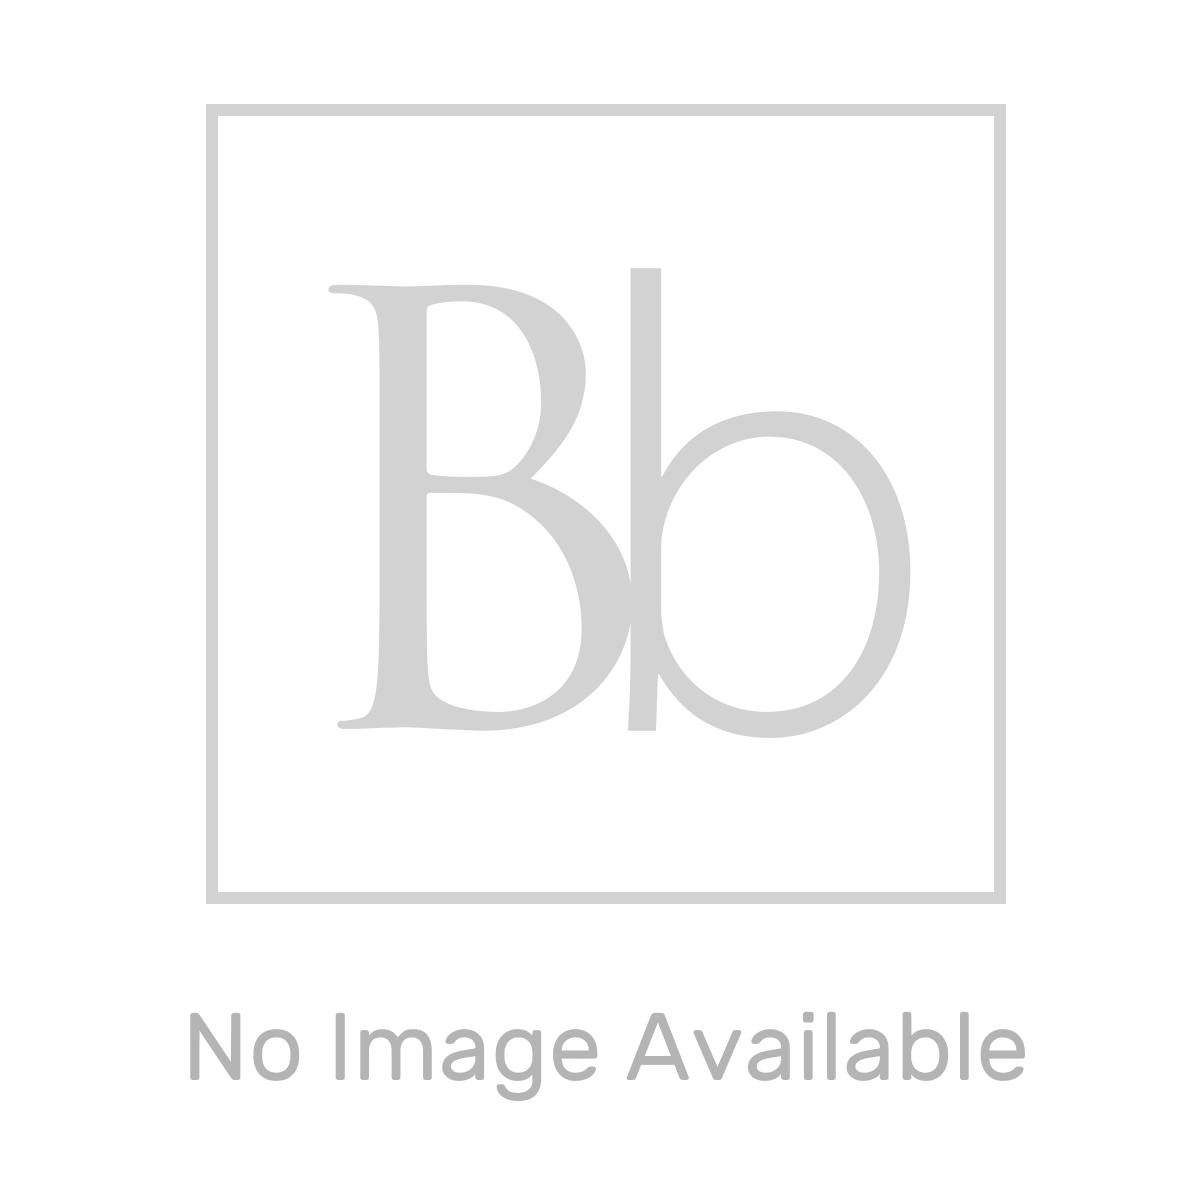 Aquadart White Slate Shower Tray 1700 x 800